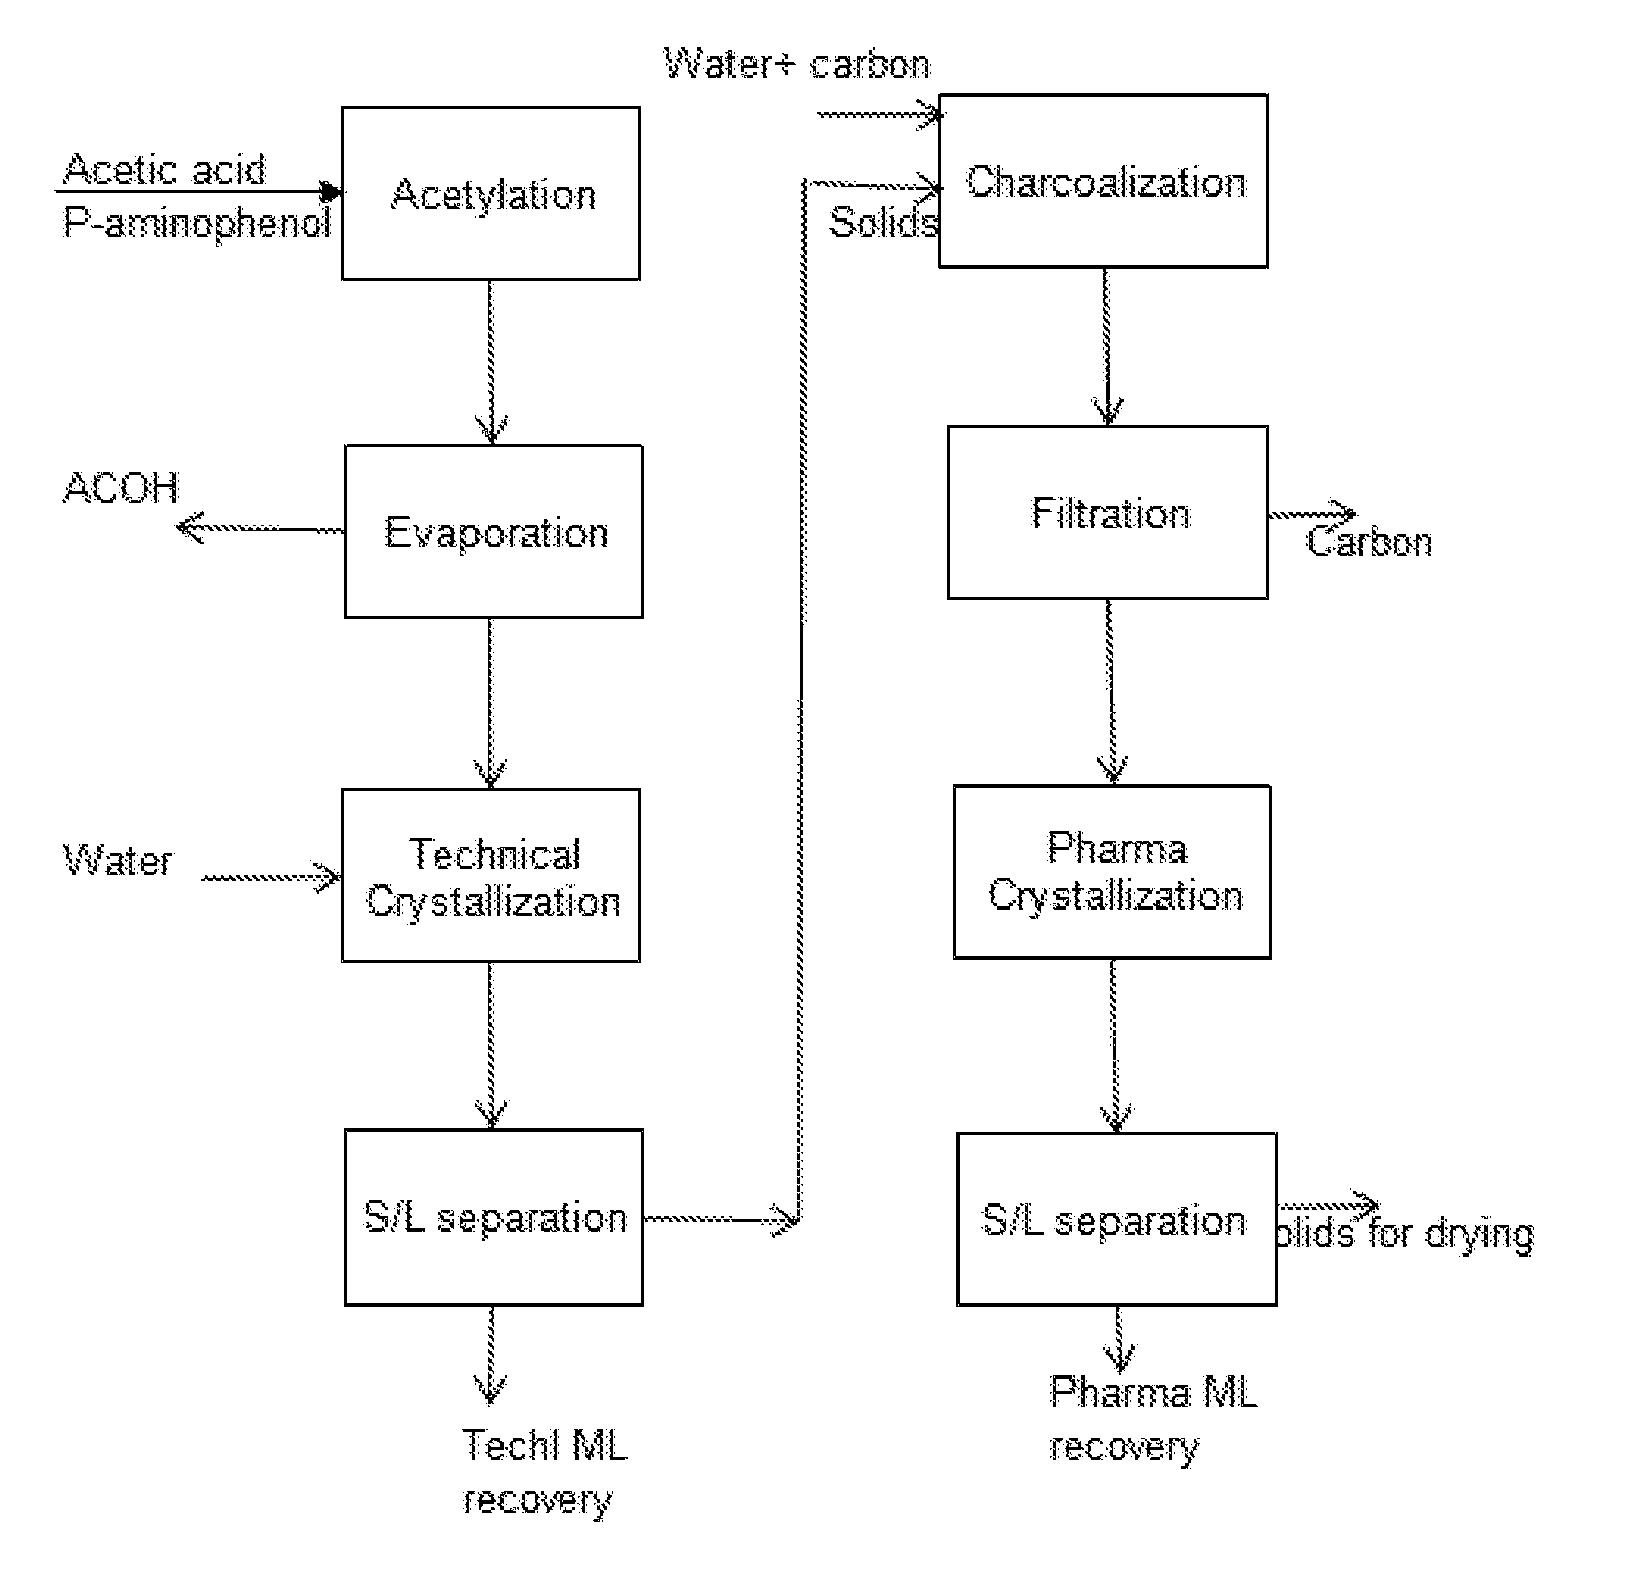 Synthesis of acetylsalicylic acid